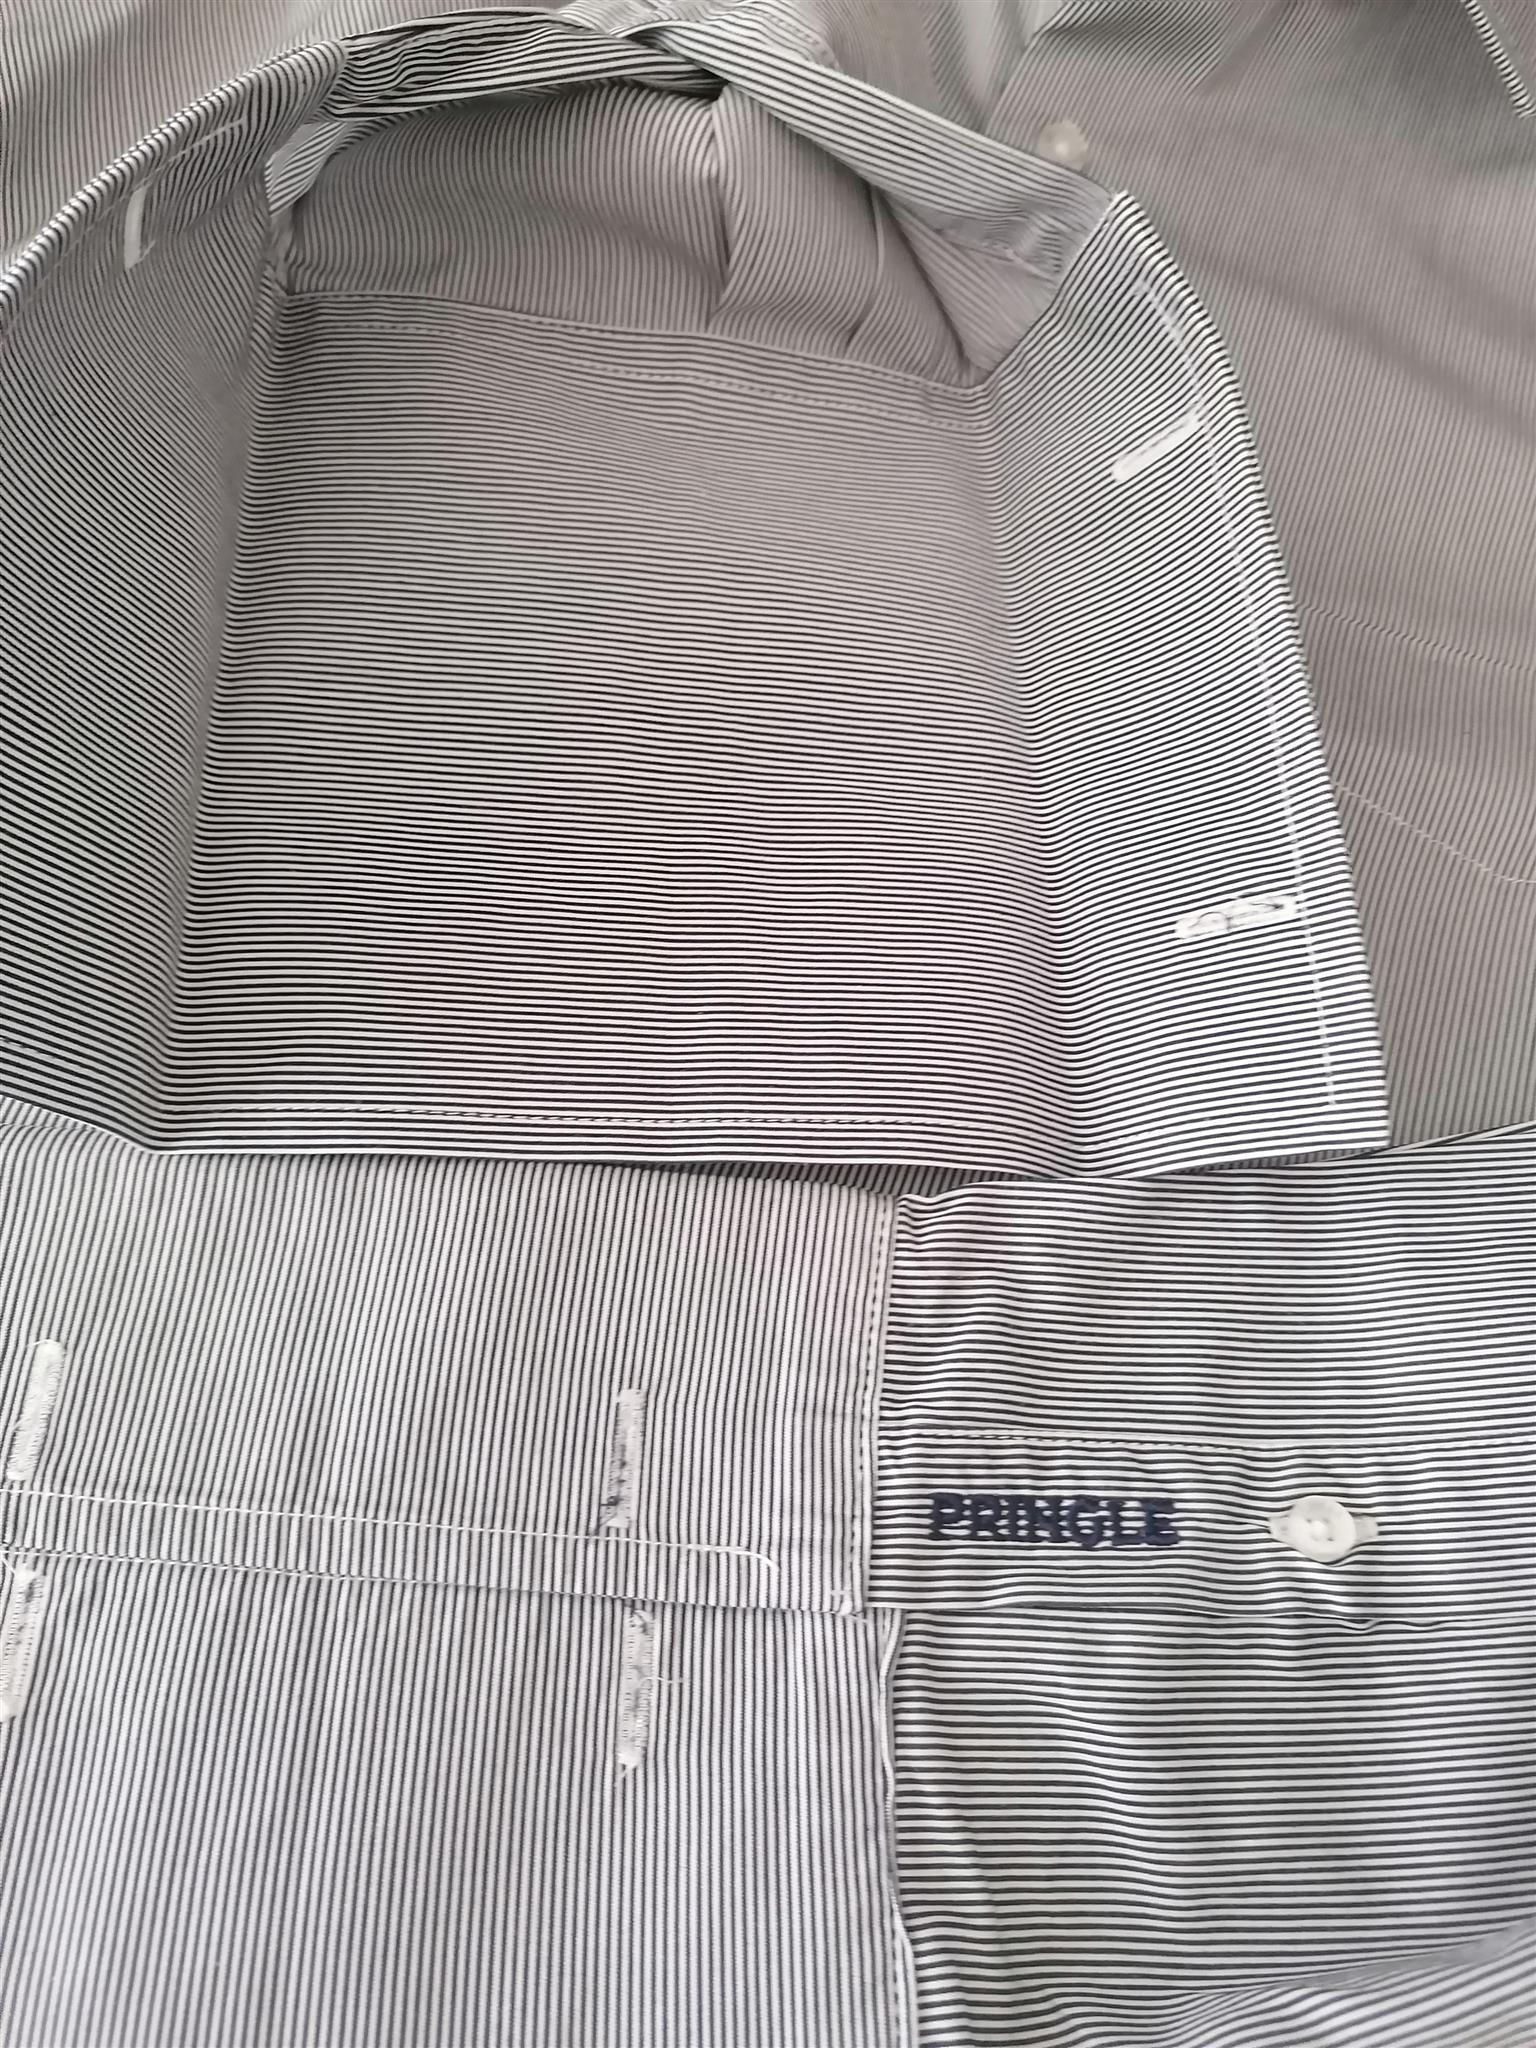 Mens Pringle cufflink cuff shirt